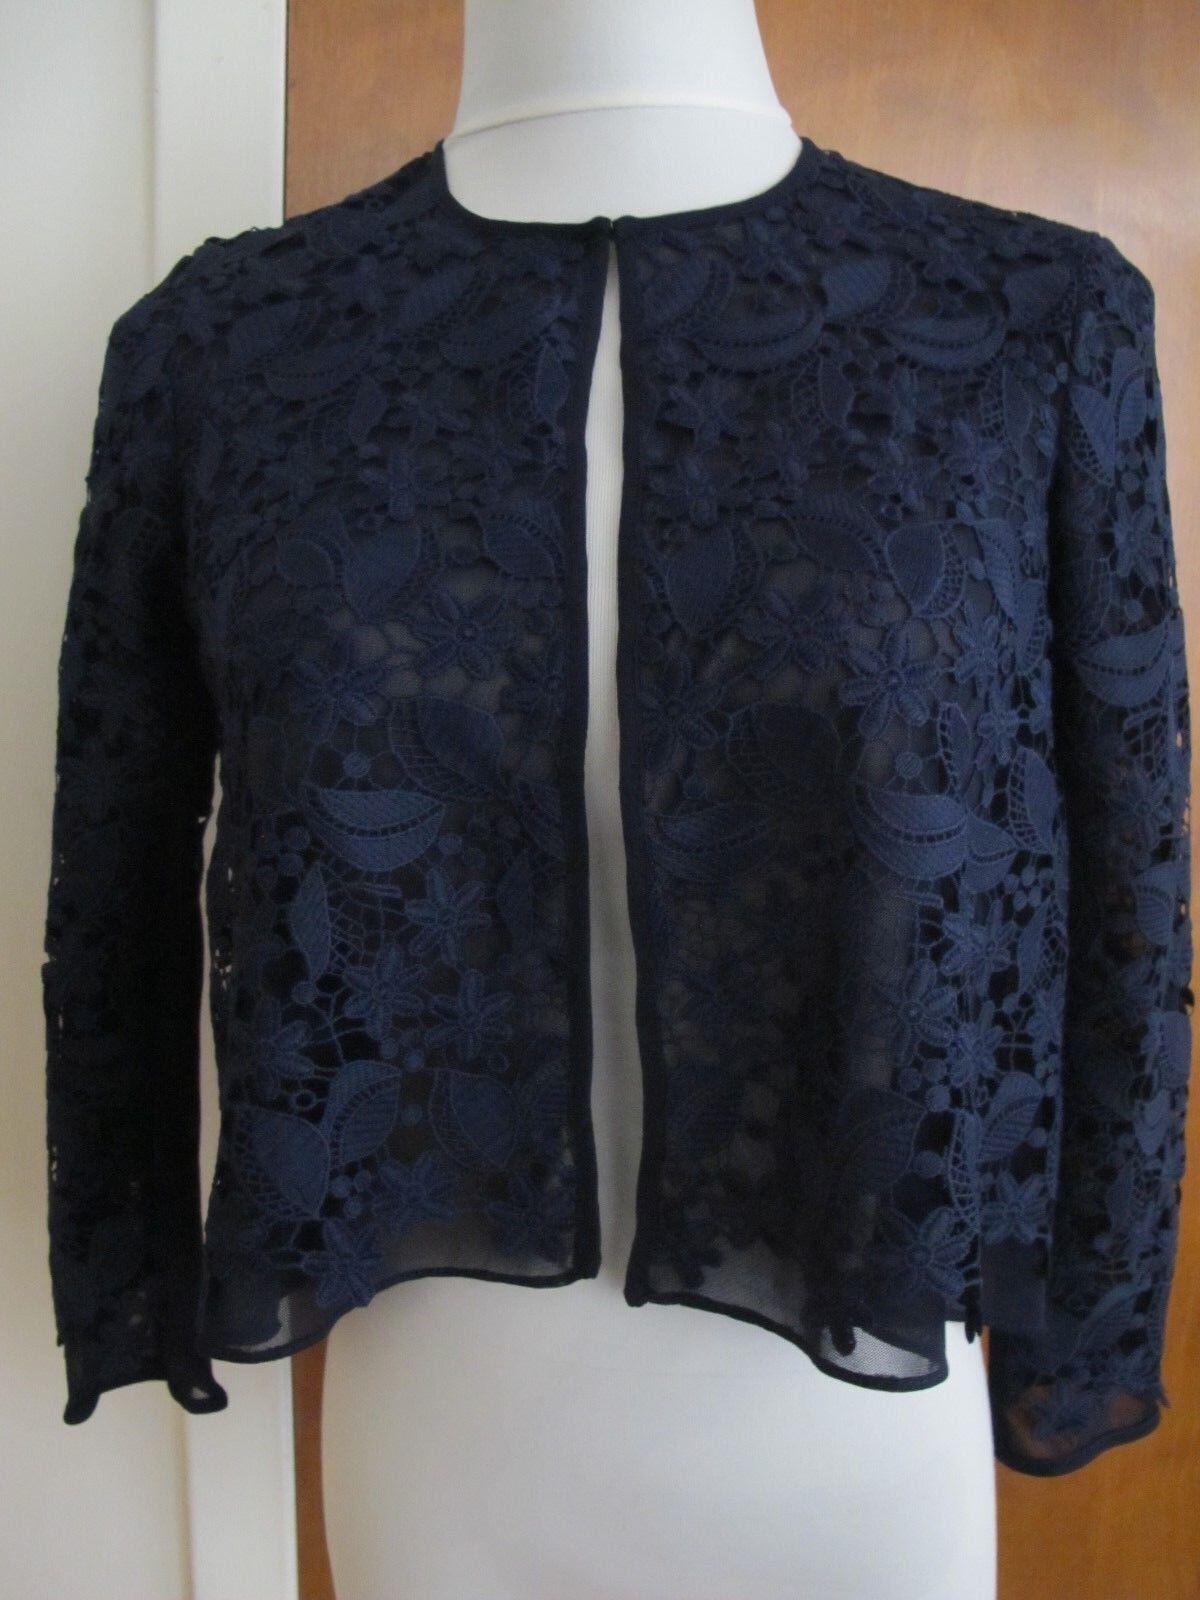 Ralph Lauren damen navy lined cardigan Größe 4 NWT